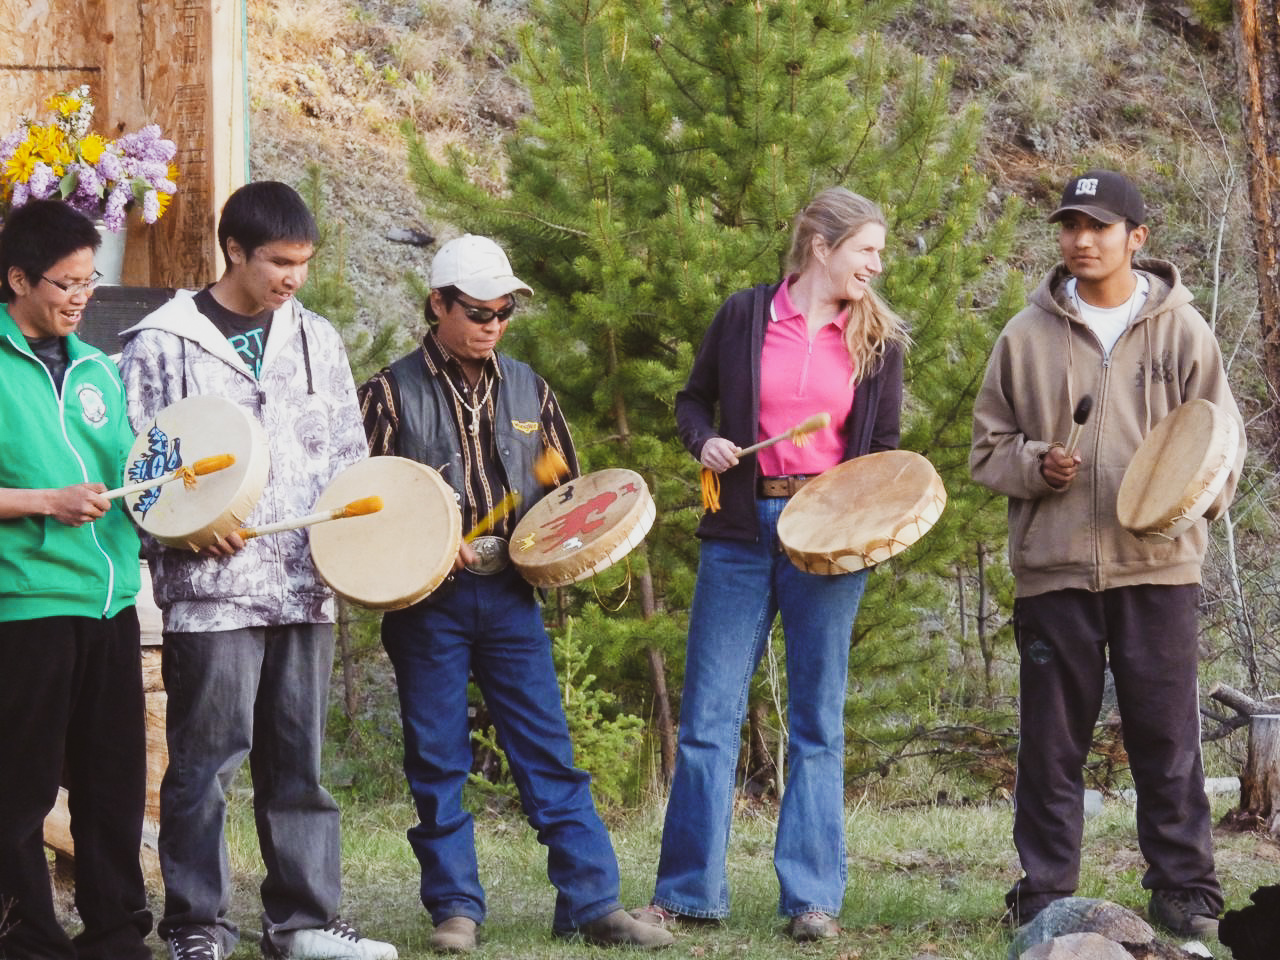 Shari drumming with group.jpg